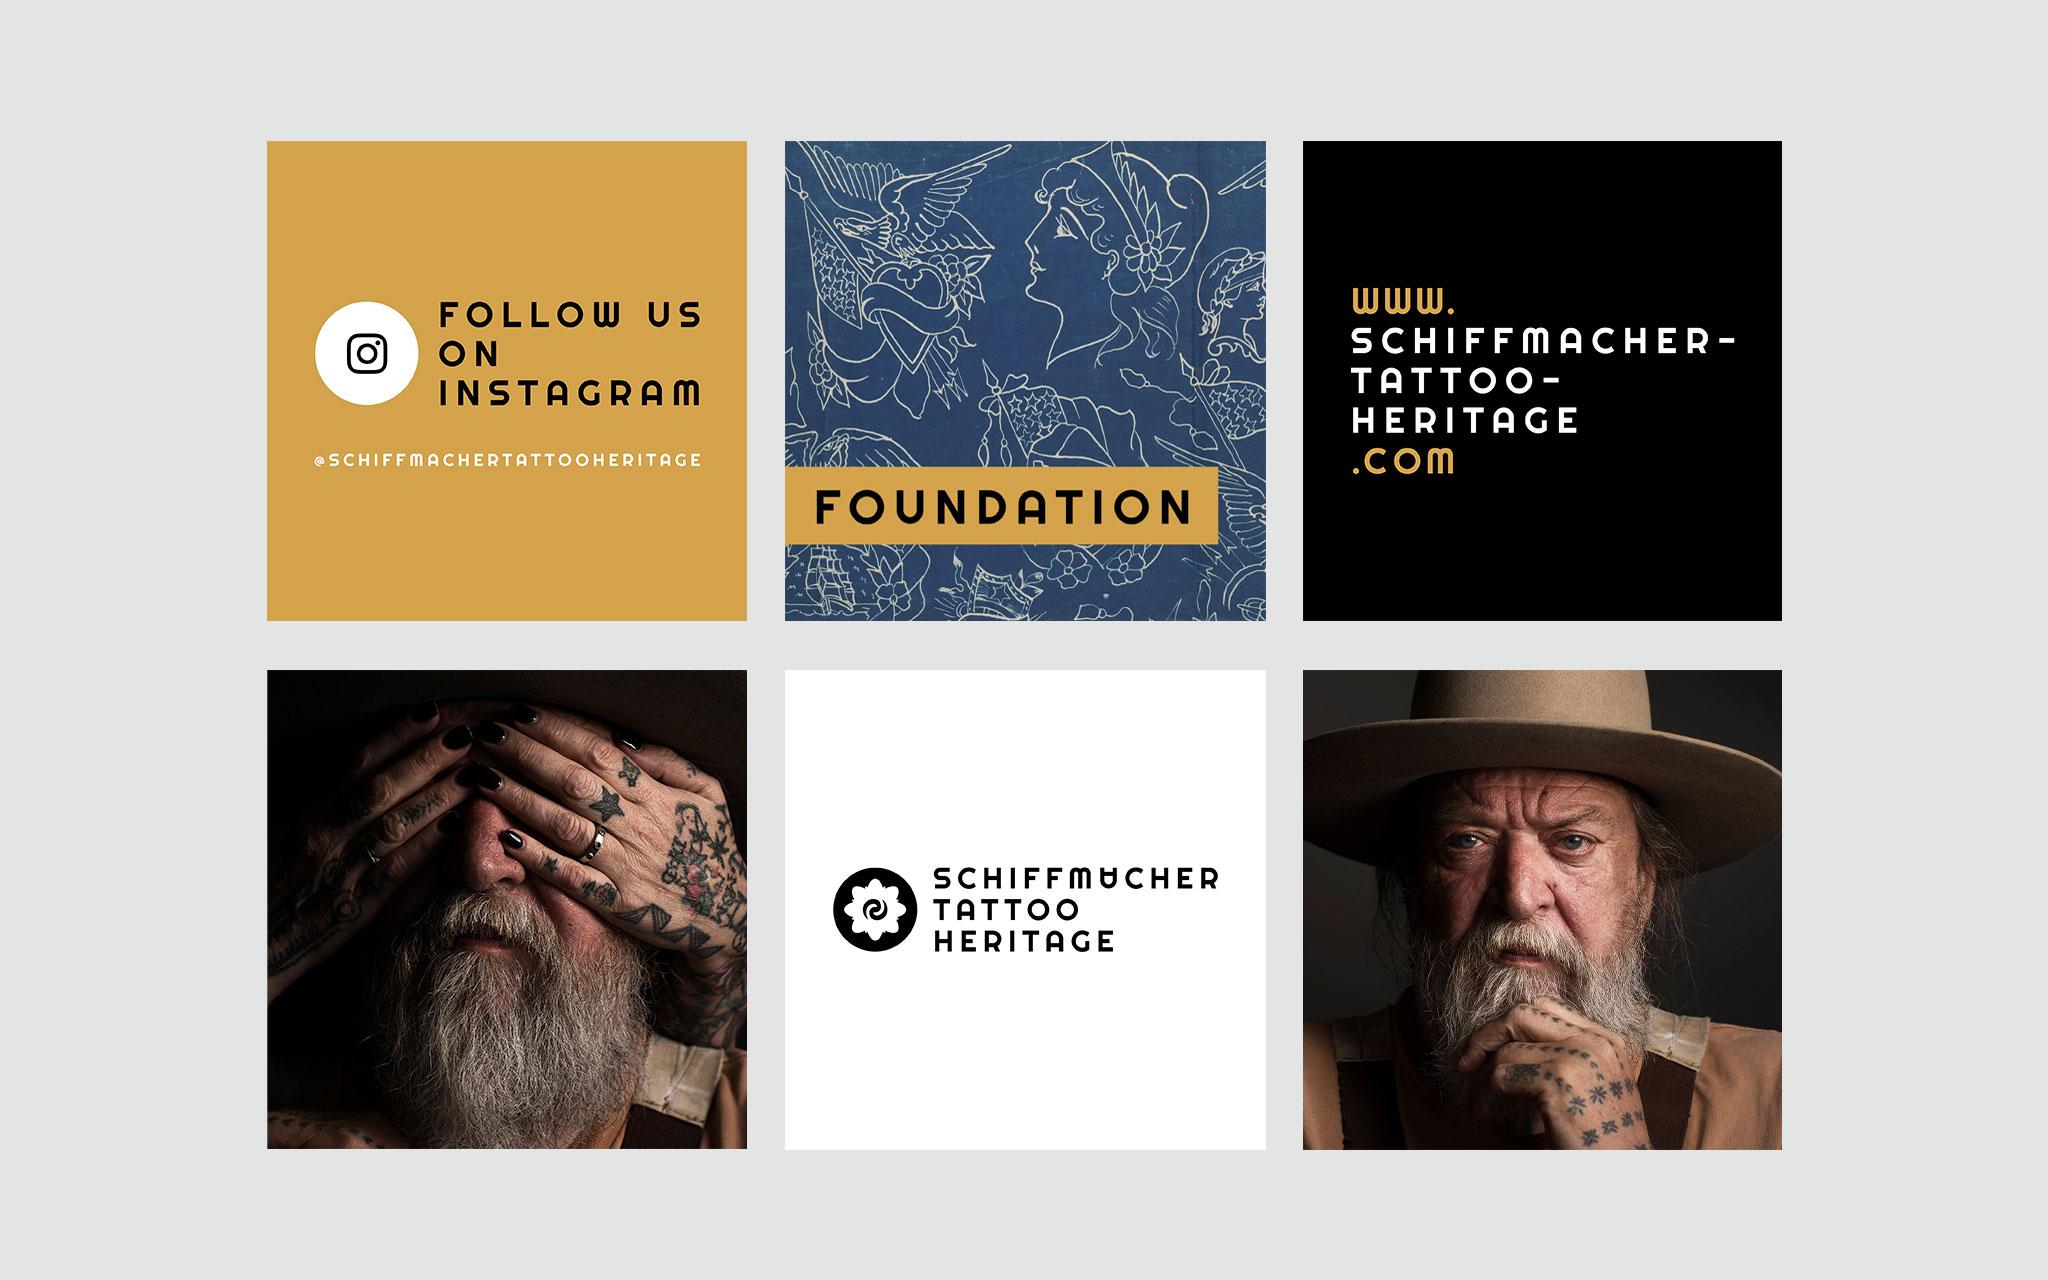 Schiffmacher Tattoo Heritage voorstel Instagram posts